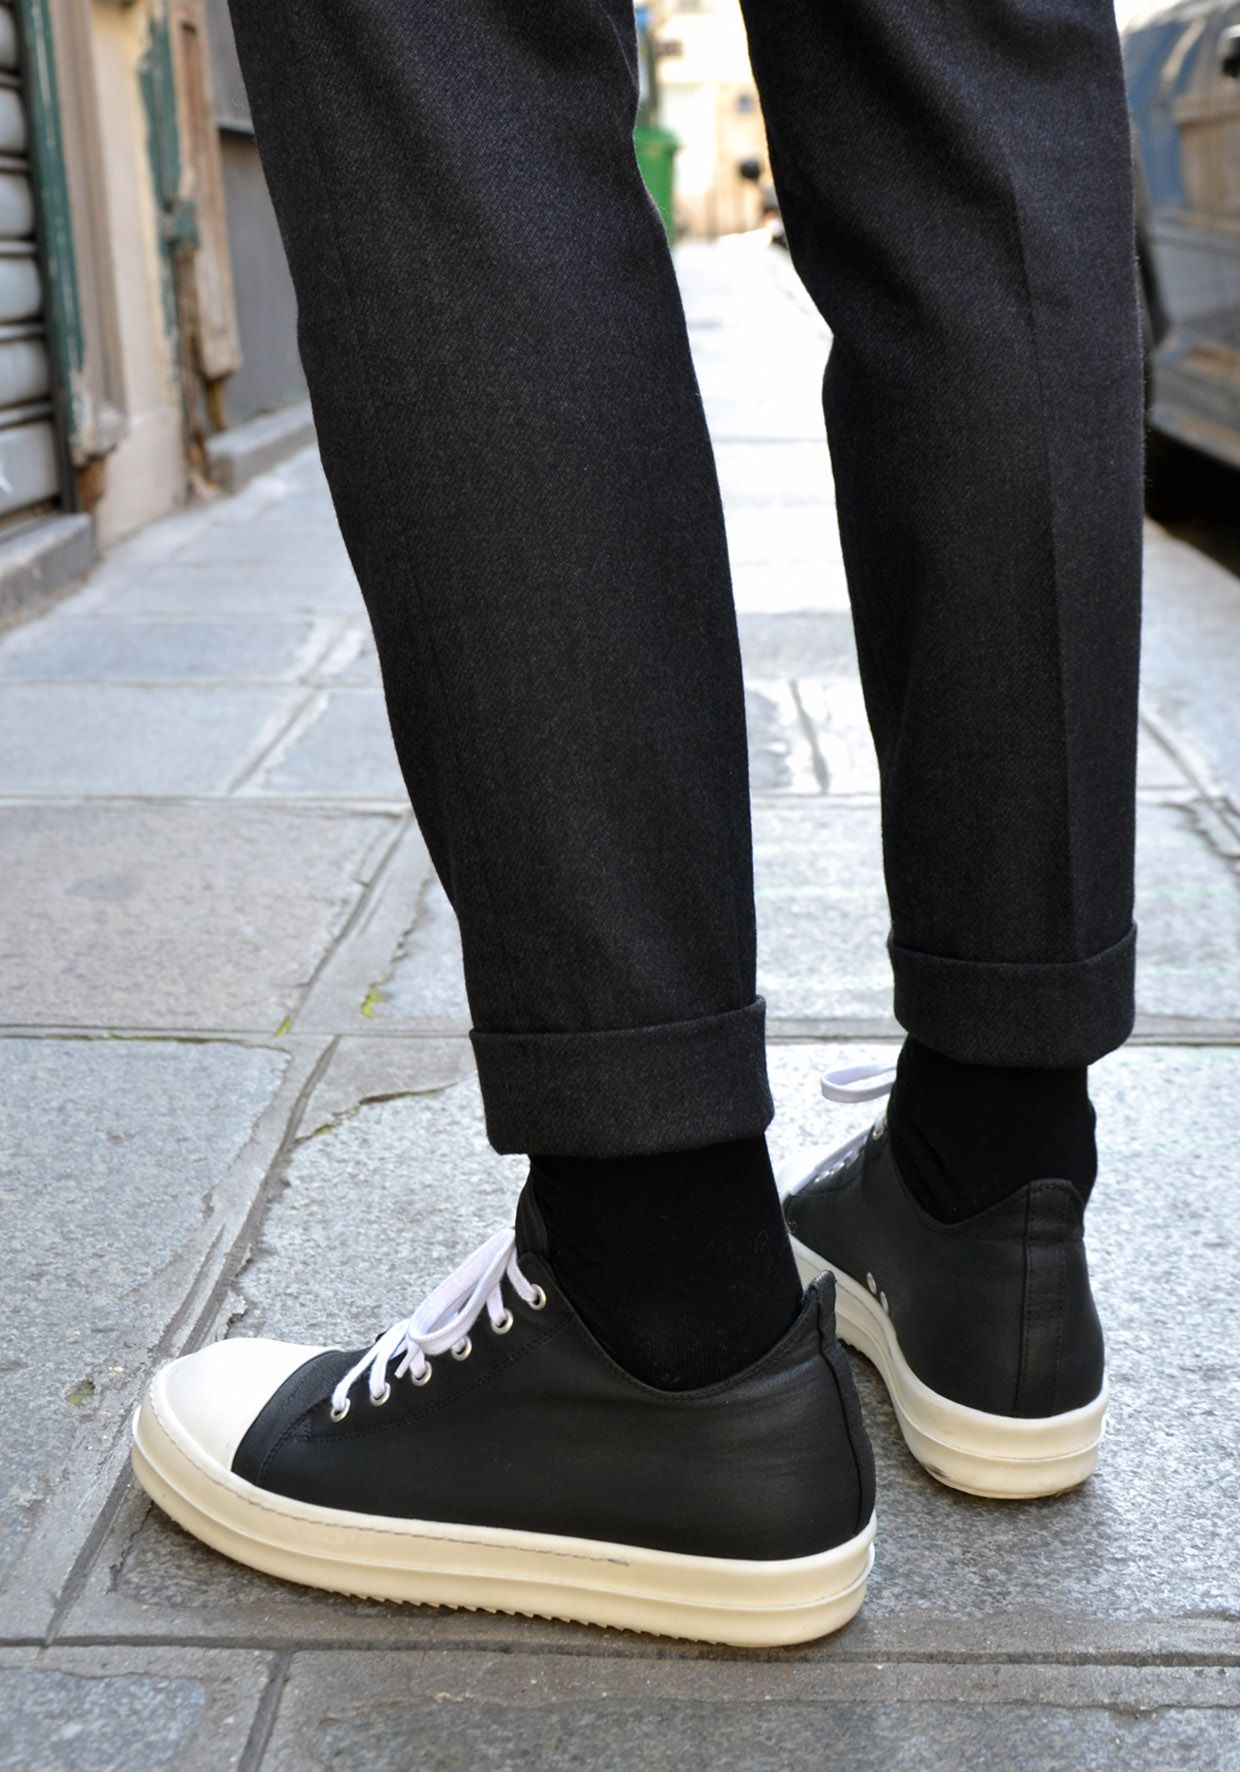 finest selection 9a6da e4fa5 HARRYJWC Rick Owens Sneakers, Men Street, Men s Style, Male Style, Guy Style